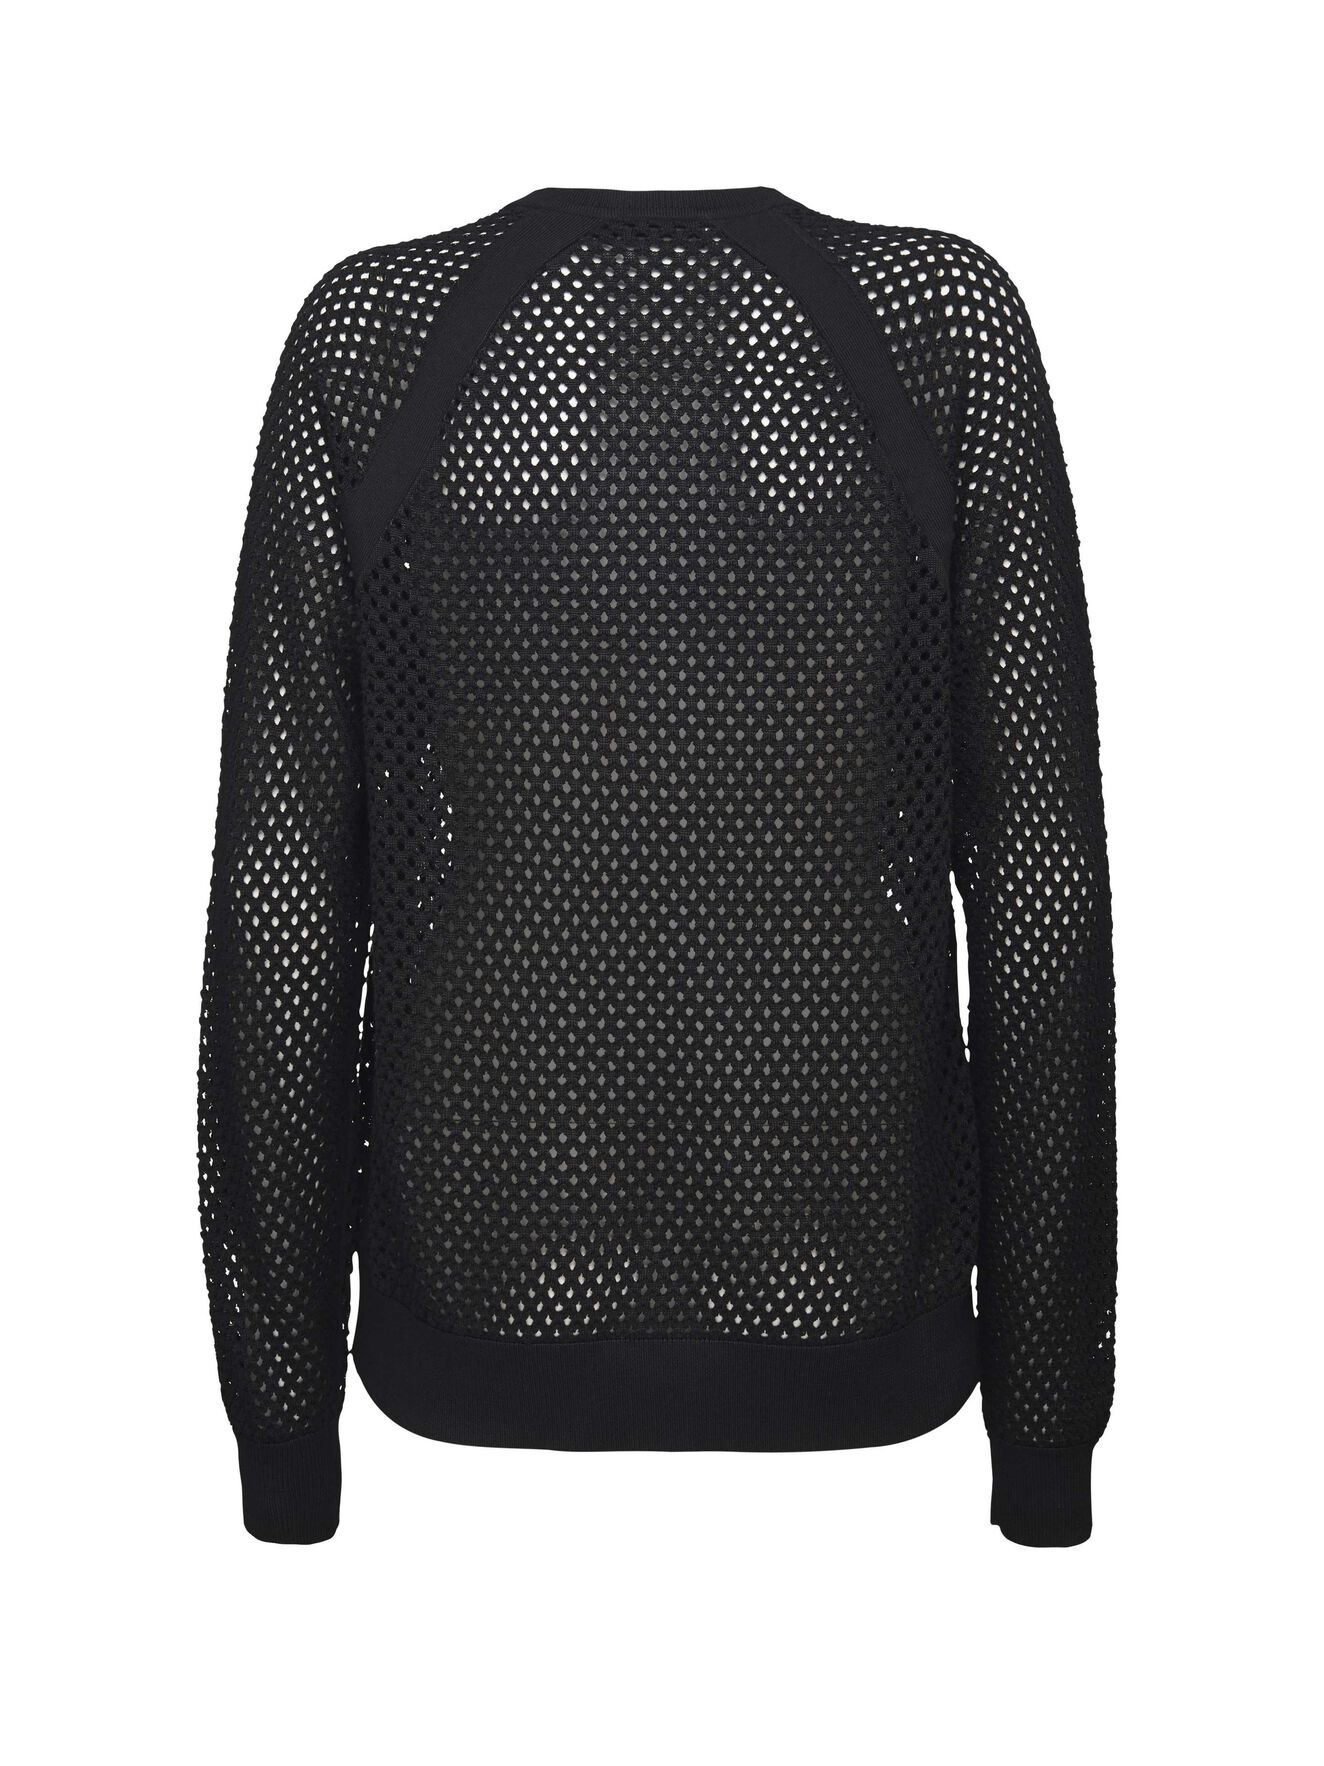 Skeletal Cardigan Pullover Strickjacken Online Kaufen